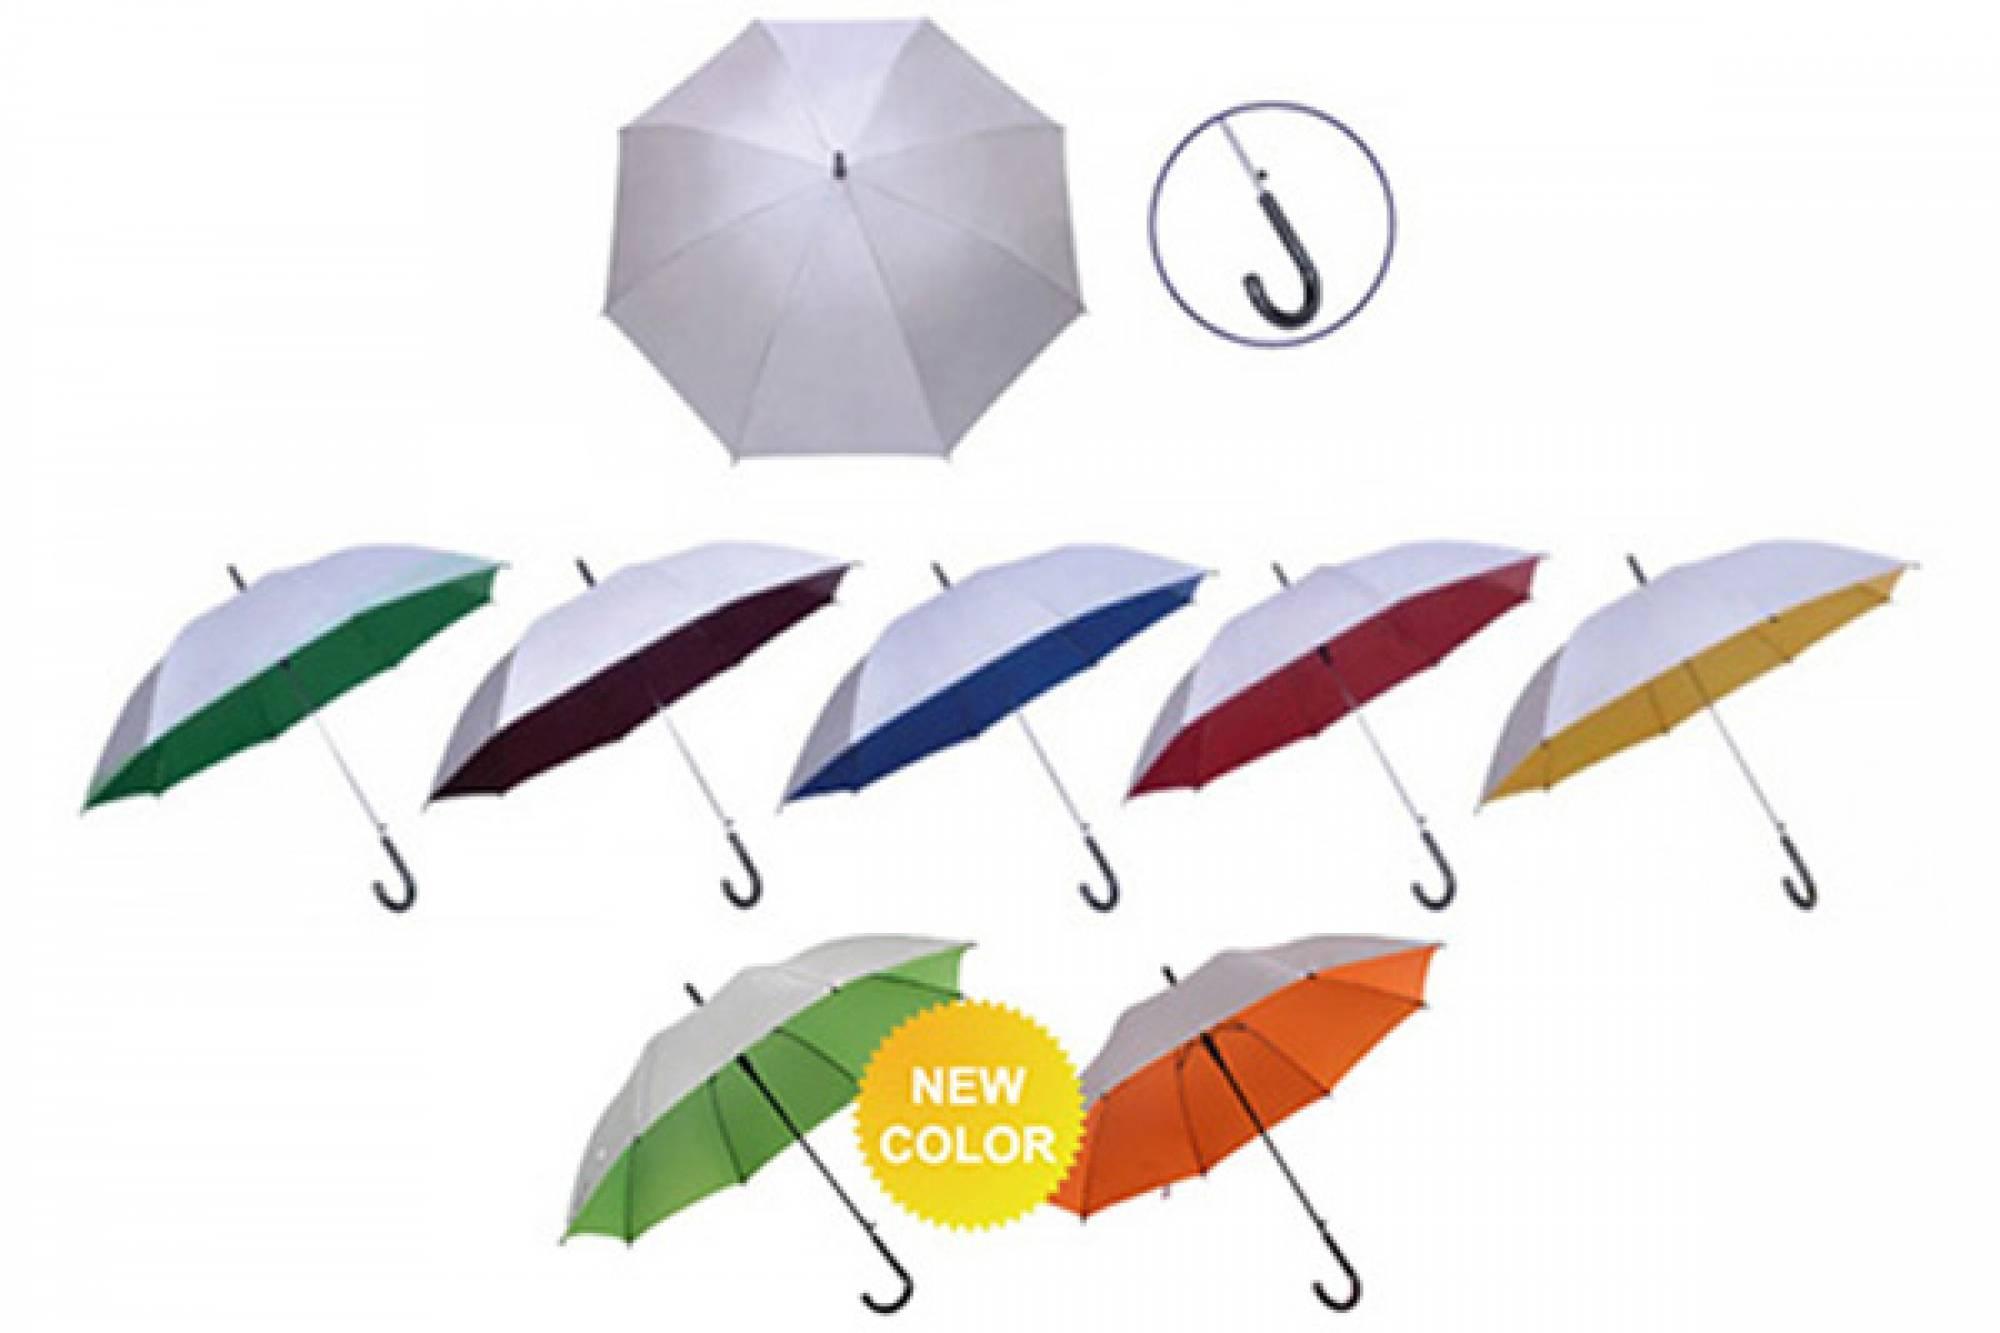 24 Silver Coated Umbrella